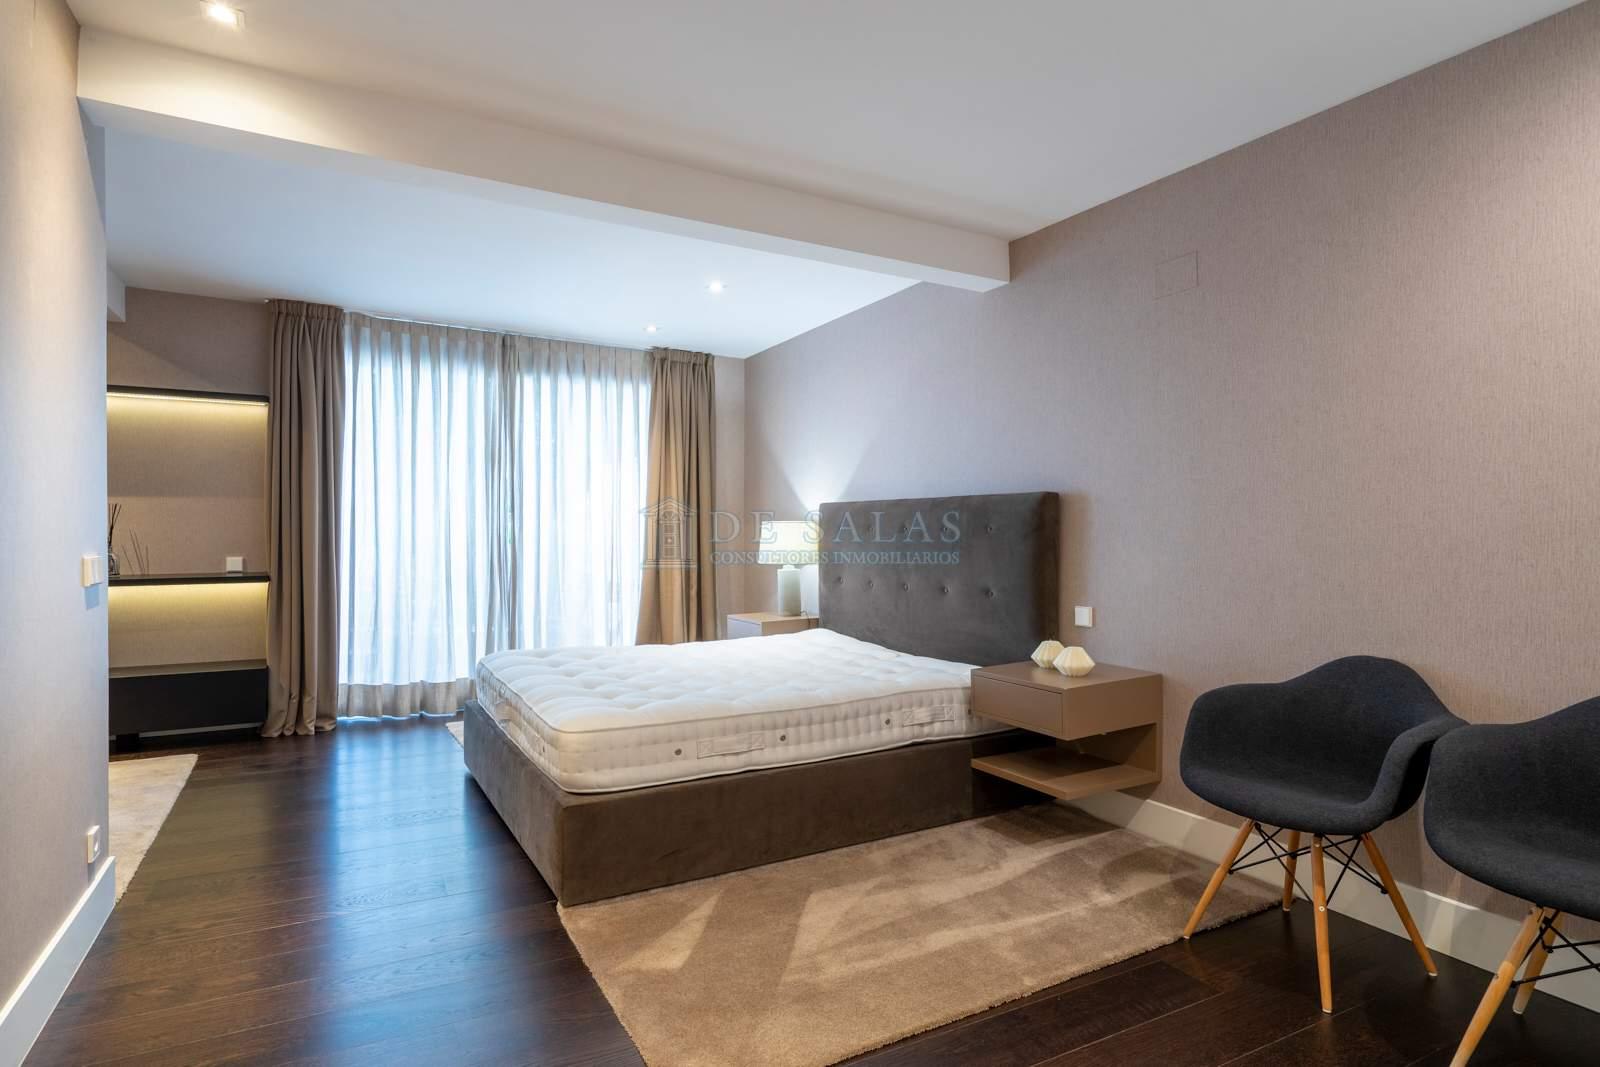 Dormitorio inv. 2-41 Maison La Moraleja